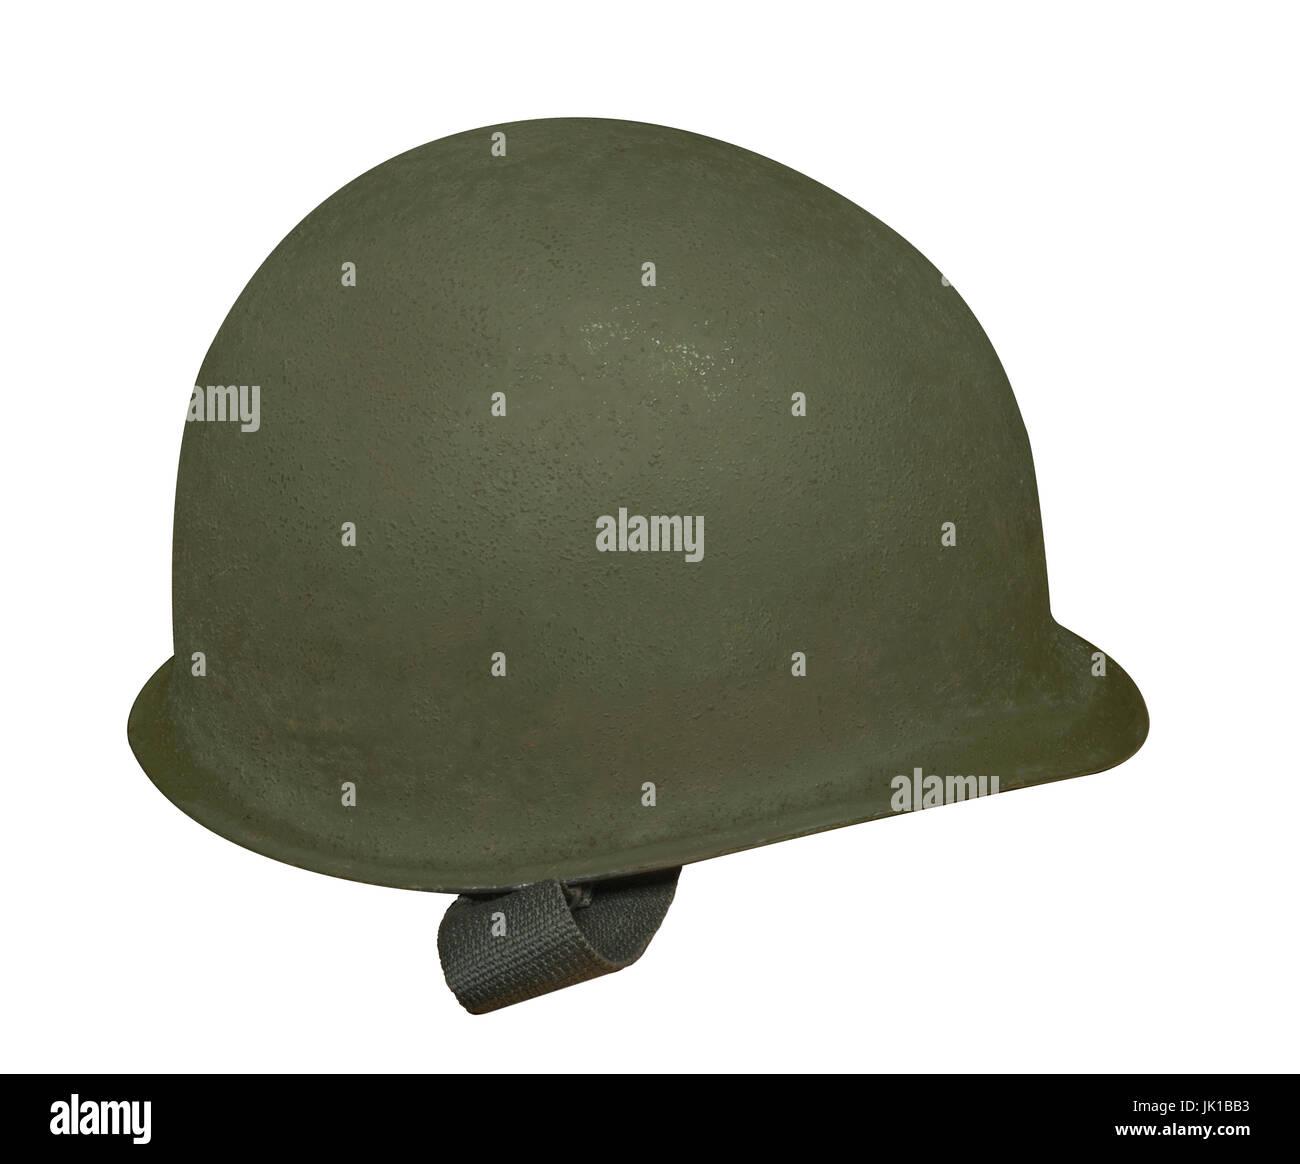 WW2 American M1 Helmet - Stock Image